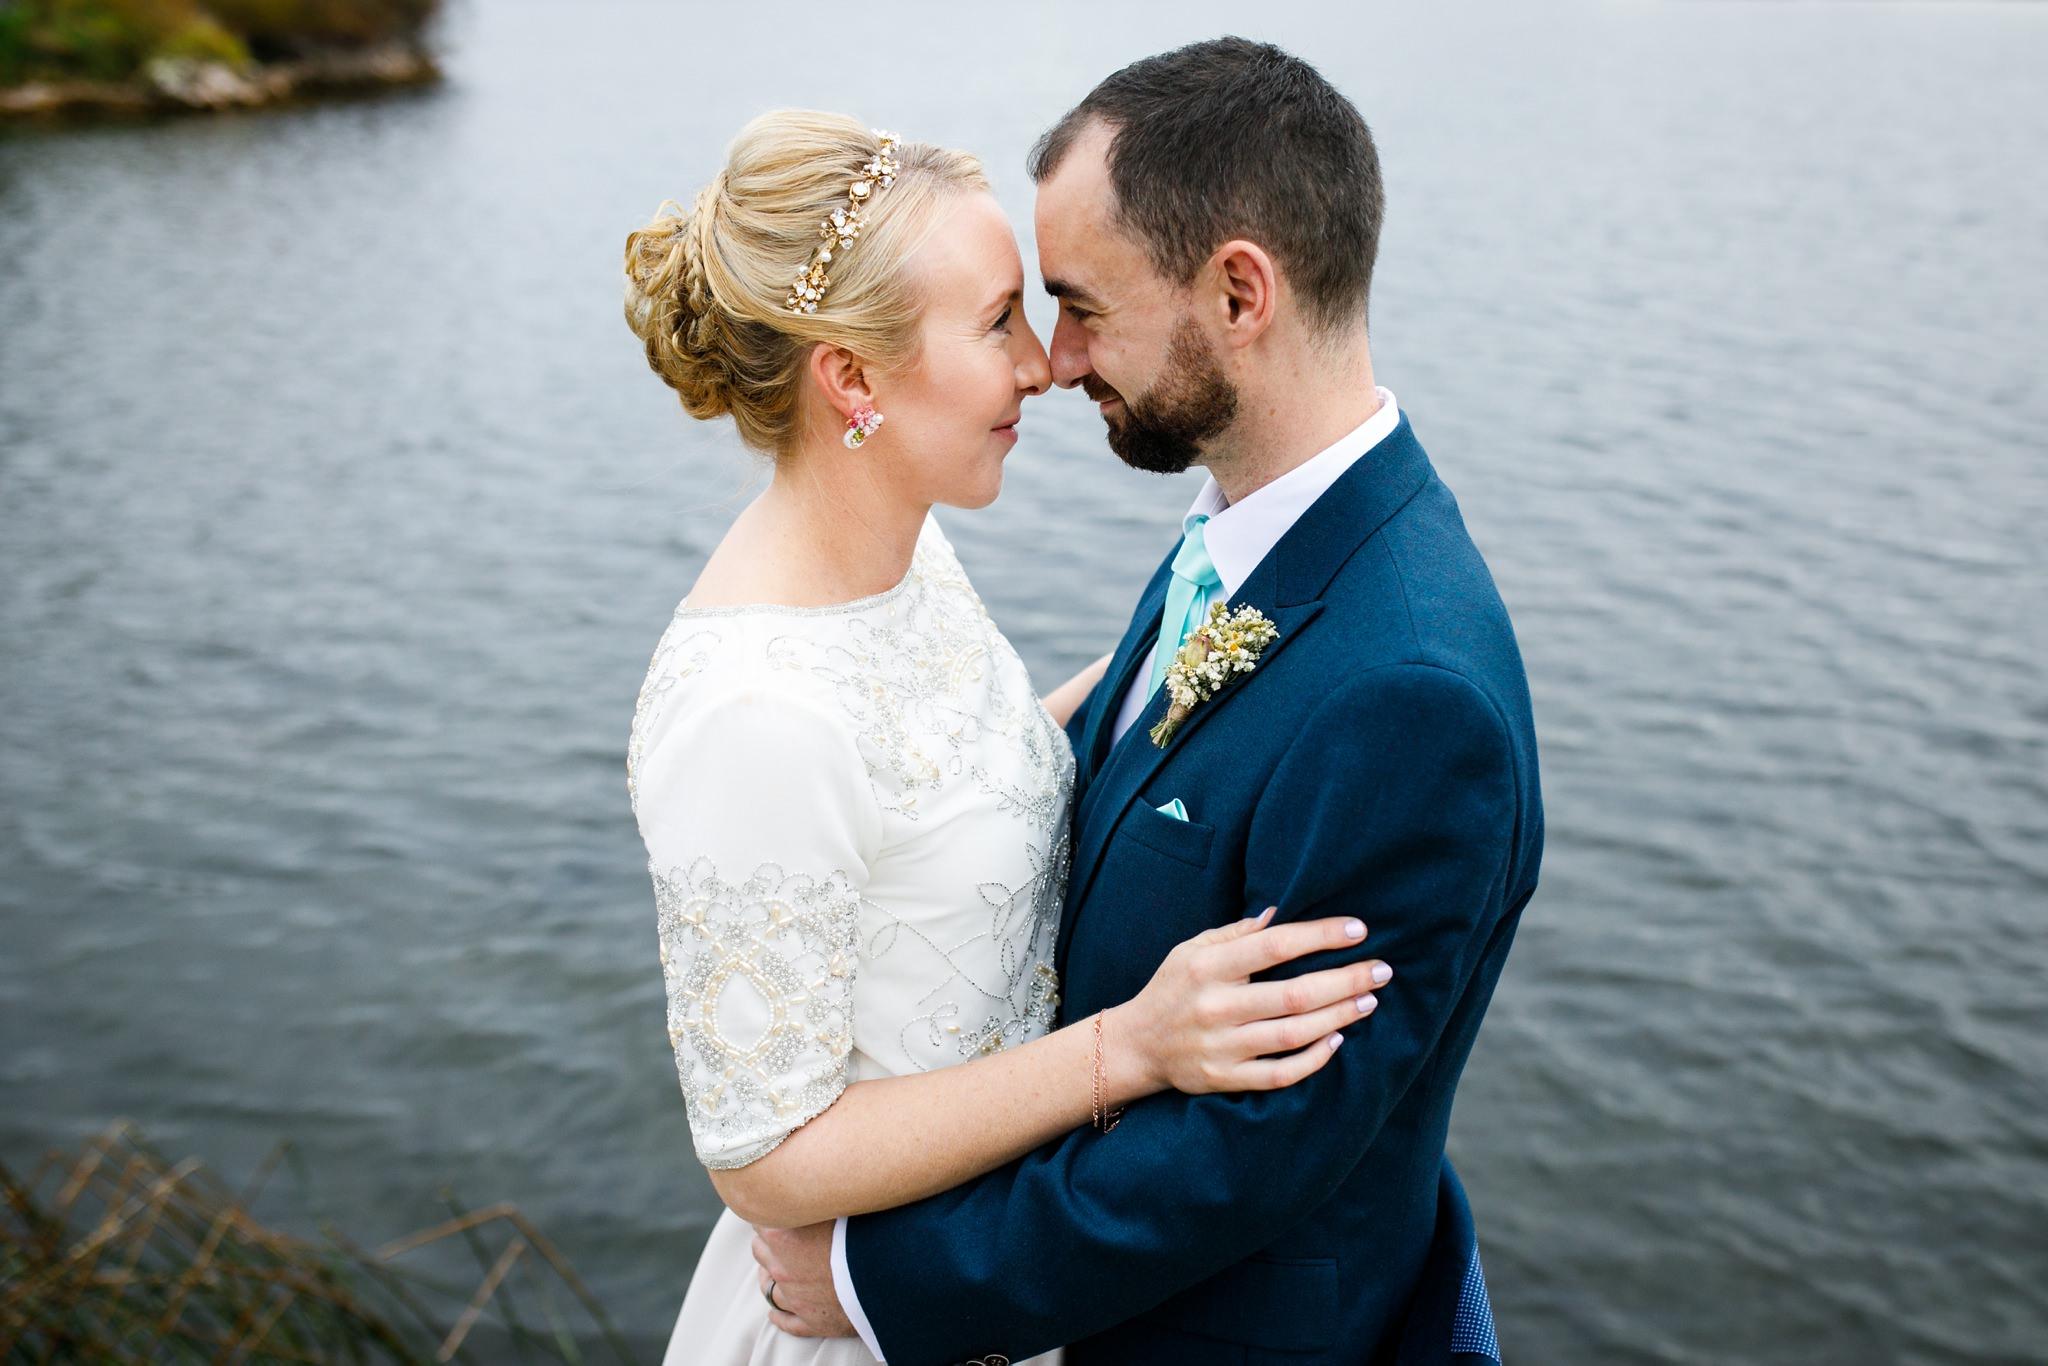 Elisha-Clarke-Photography-Dublin-City-Wedding_0086.jpg